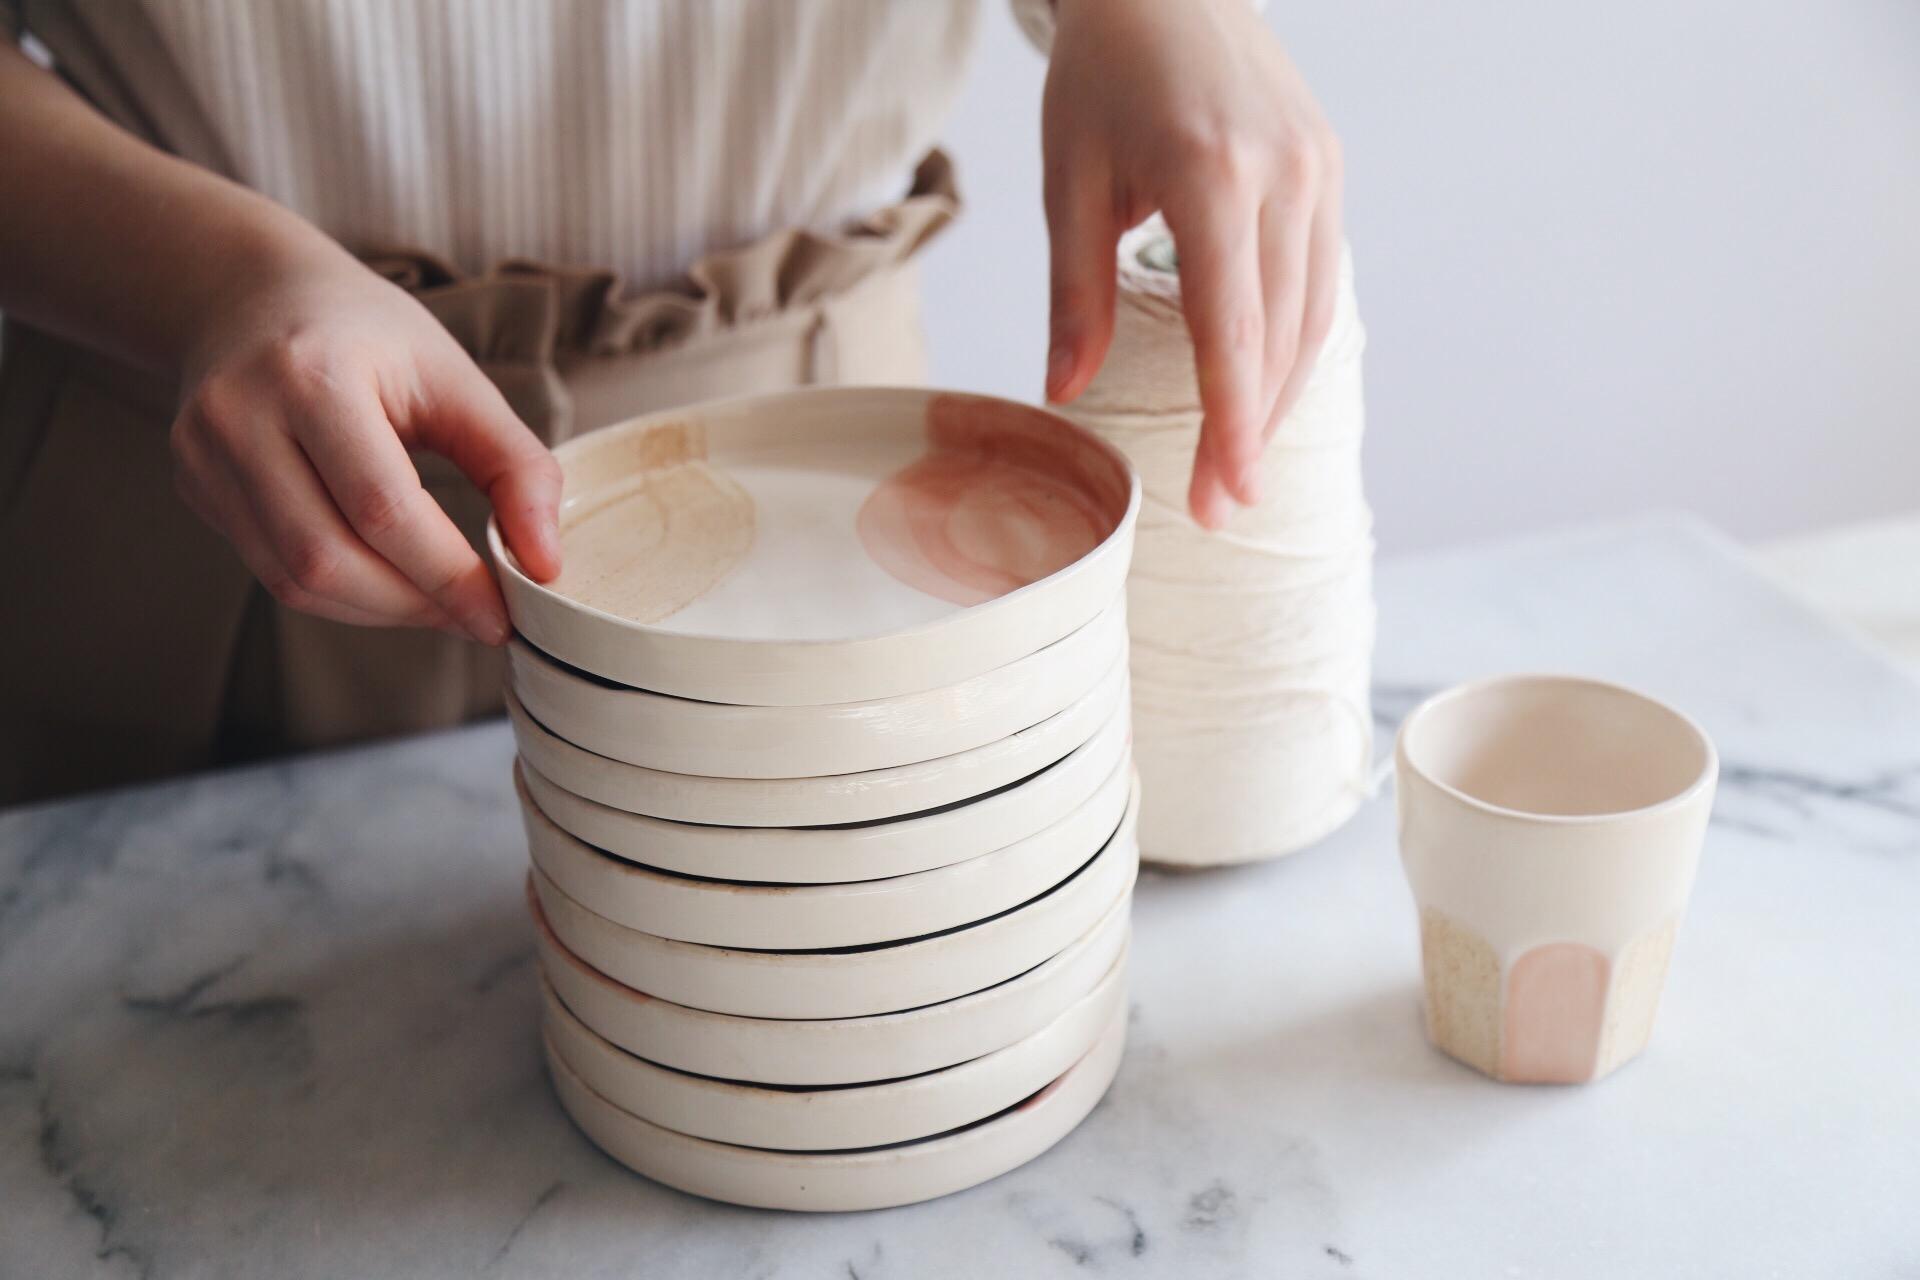 Ceramic Studio Maitoinen - plates in pile and hands